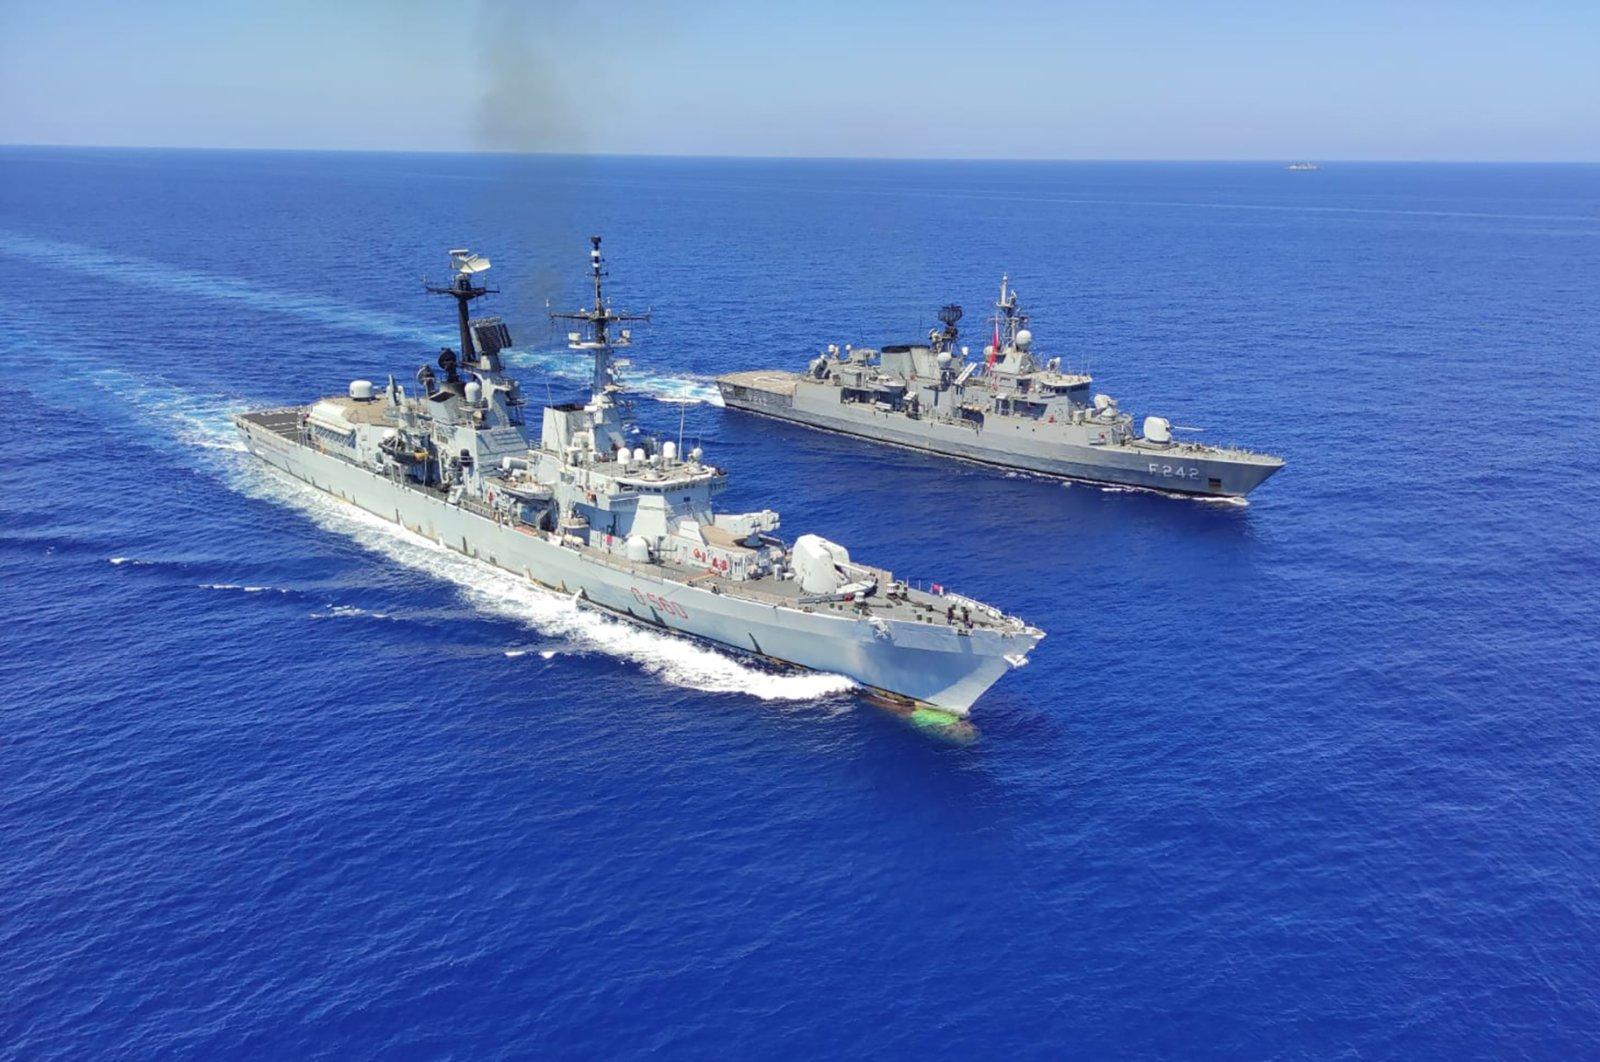 Italian destroyer ITS Durand De La Penne, left, along with Turkish frigates TCG Göksu and TCG Fatih conduct maritime trainings in the Eastern Mediterranean, Aug. 25, 2020. (AP Photo)